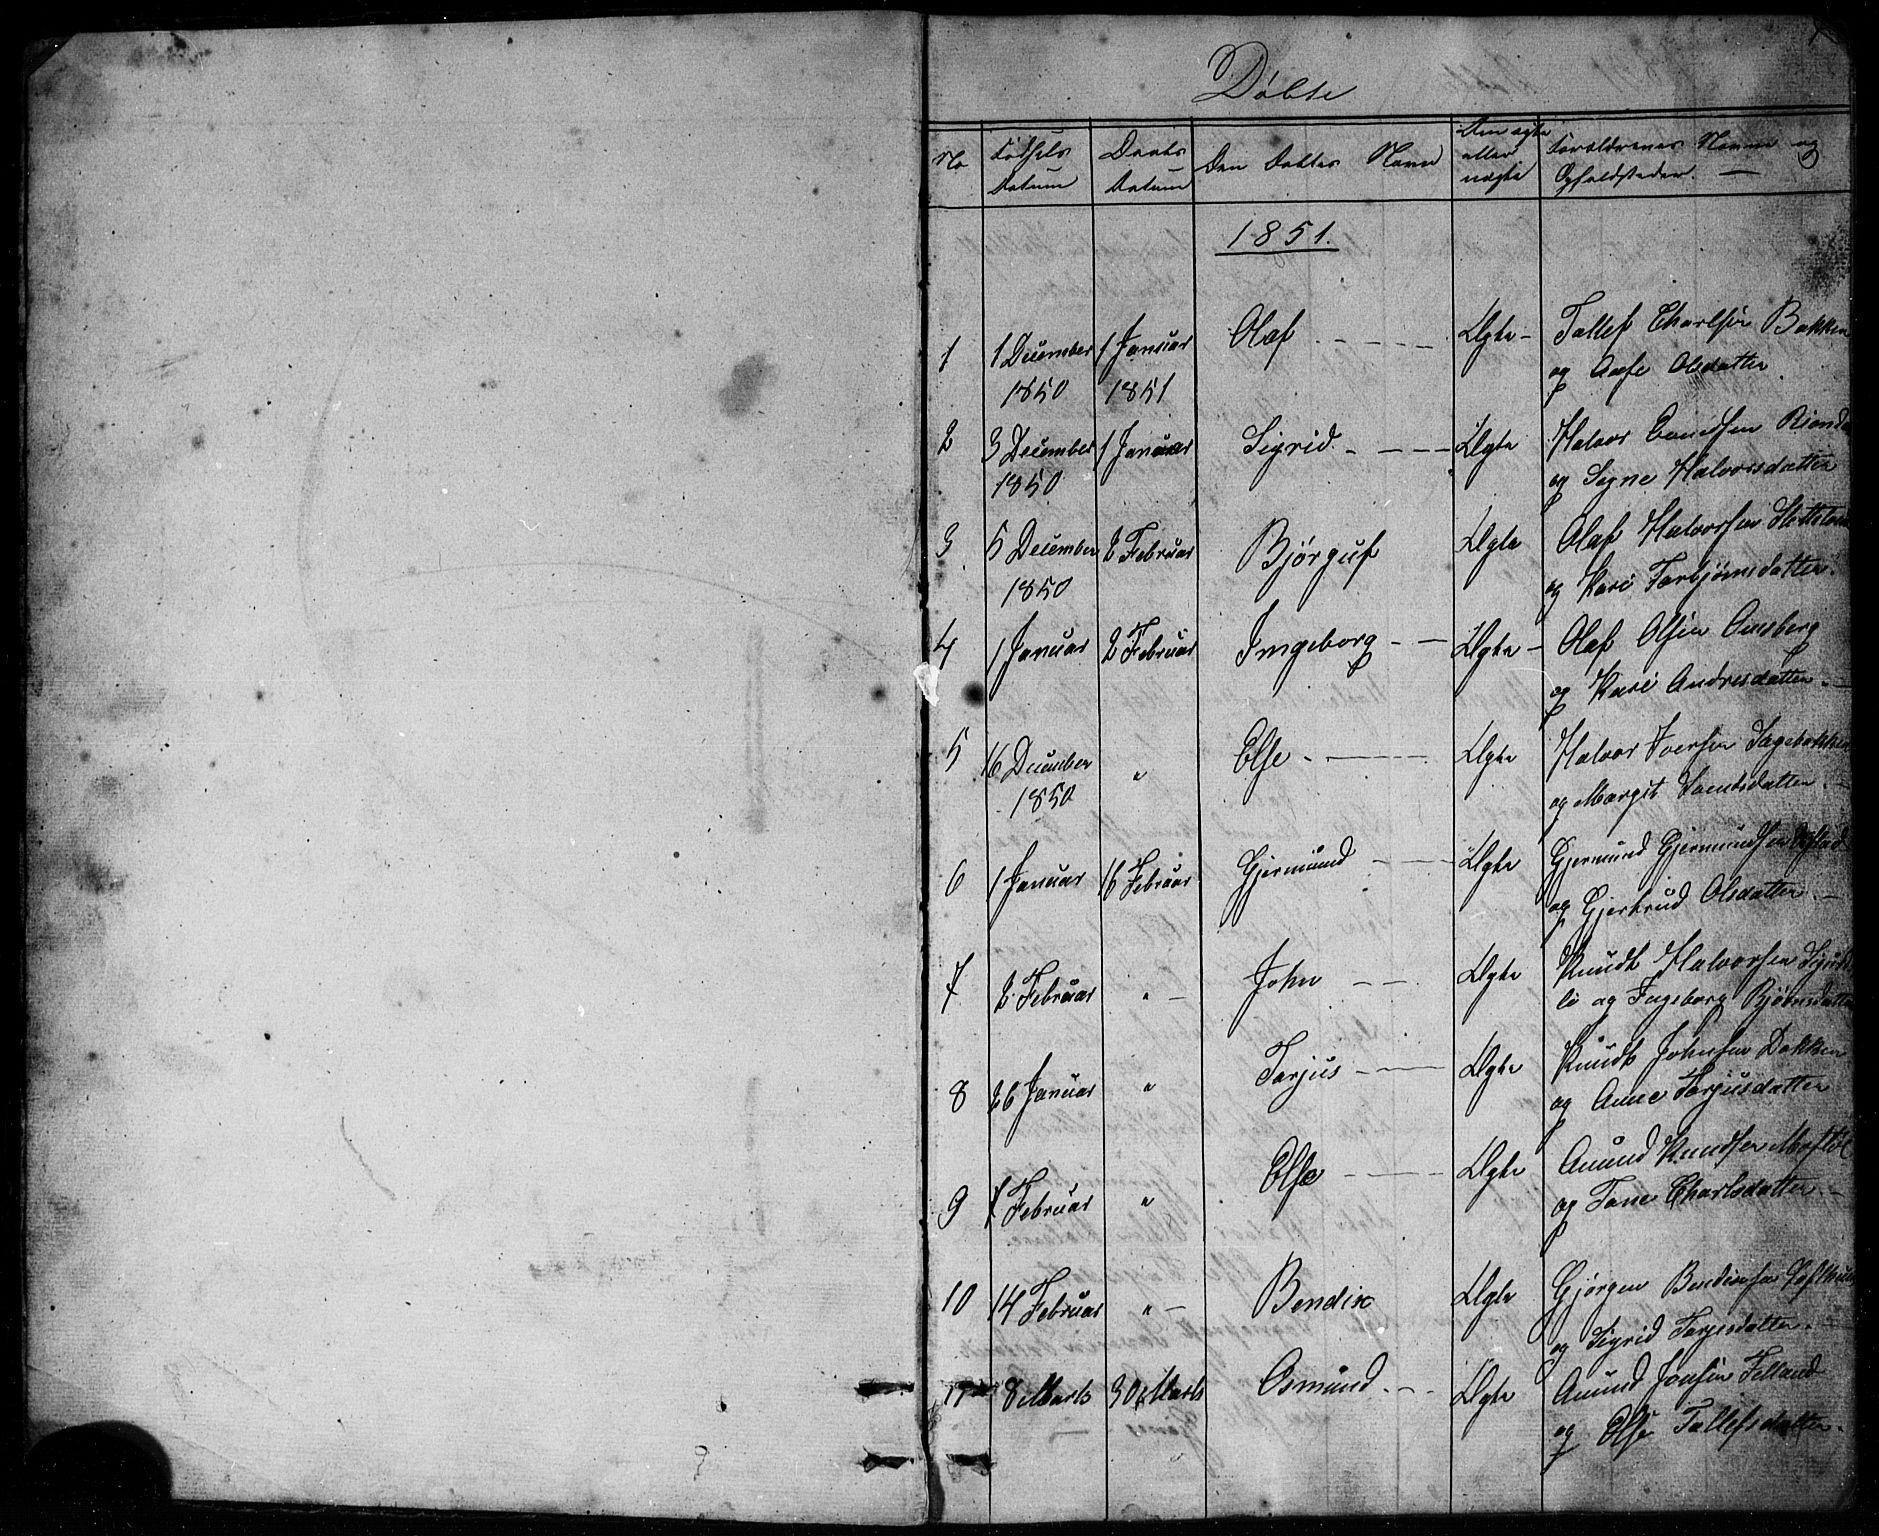 SAKO, Mo kirkebøker, G/Ga/L0001: Klokkerbok nr. I 1, 1851-1891, s. 1